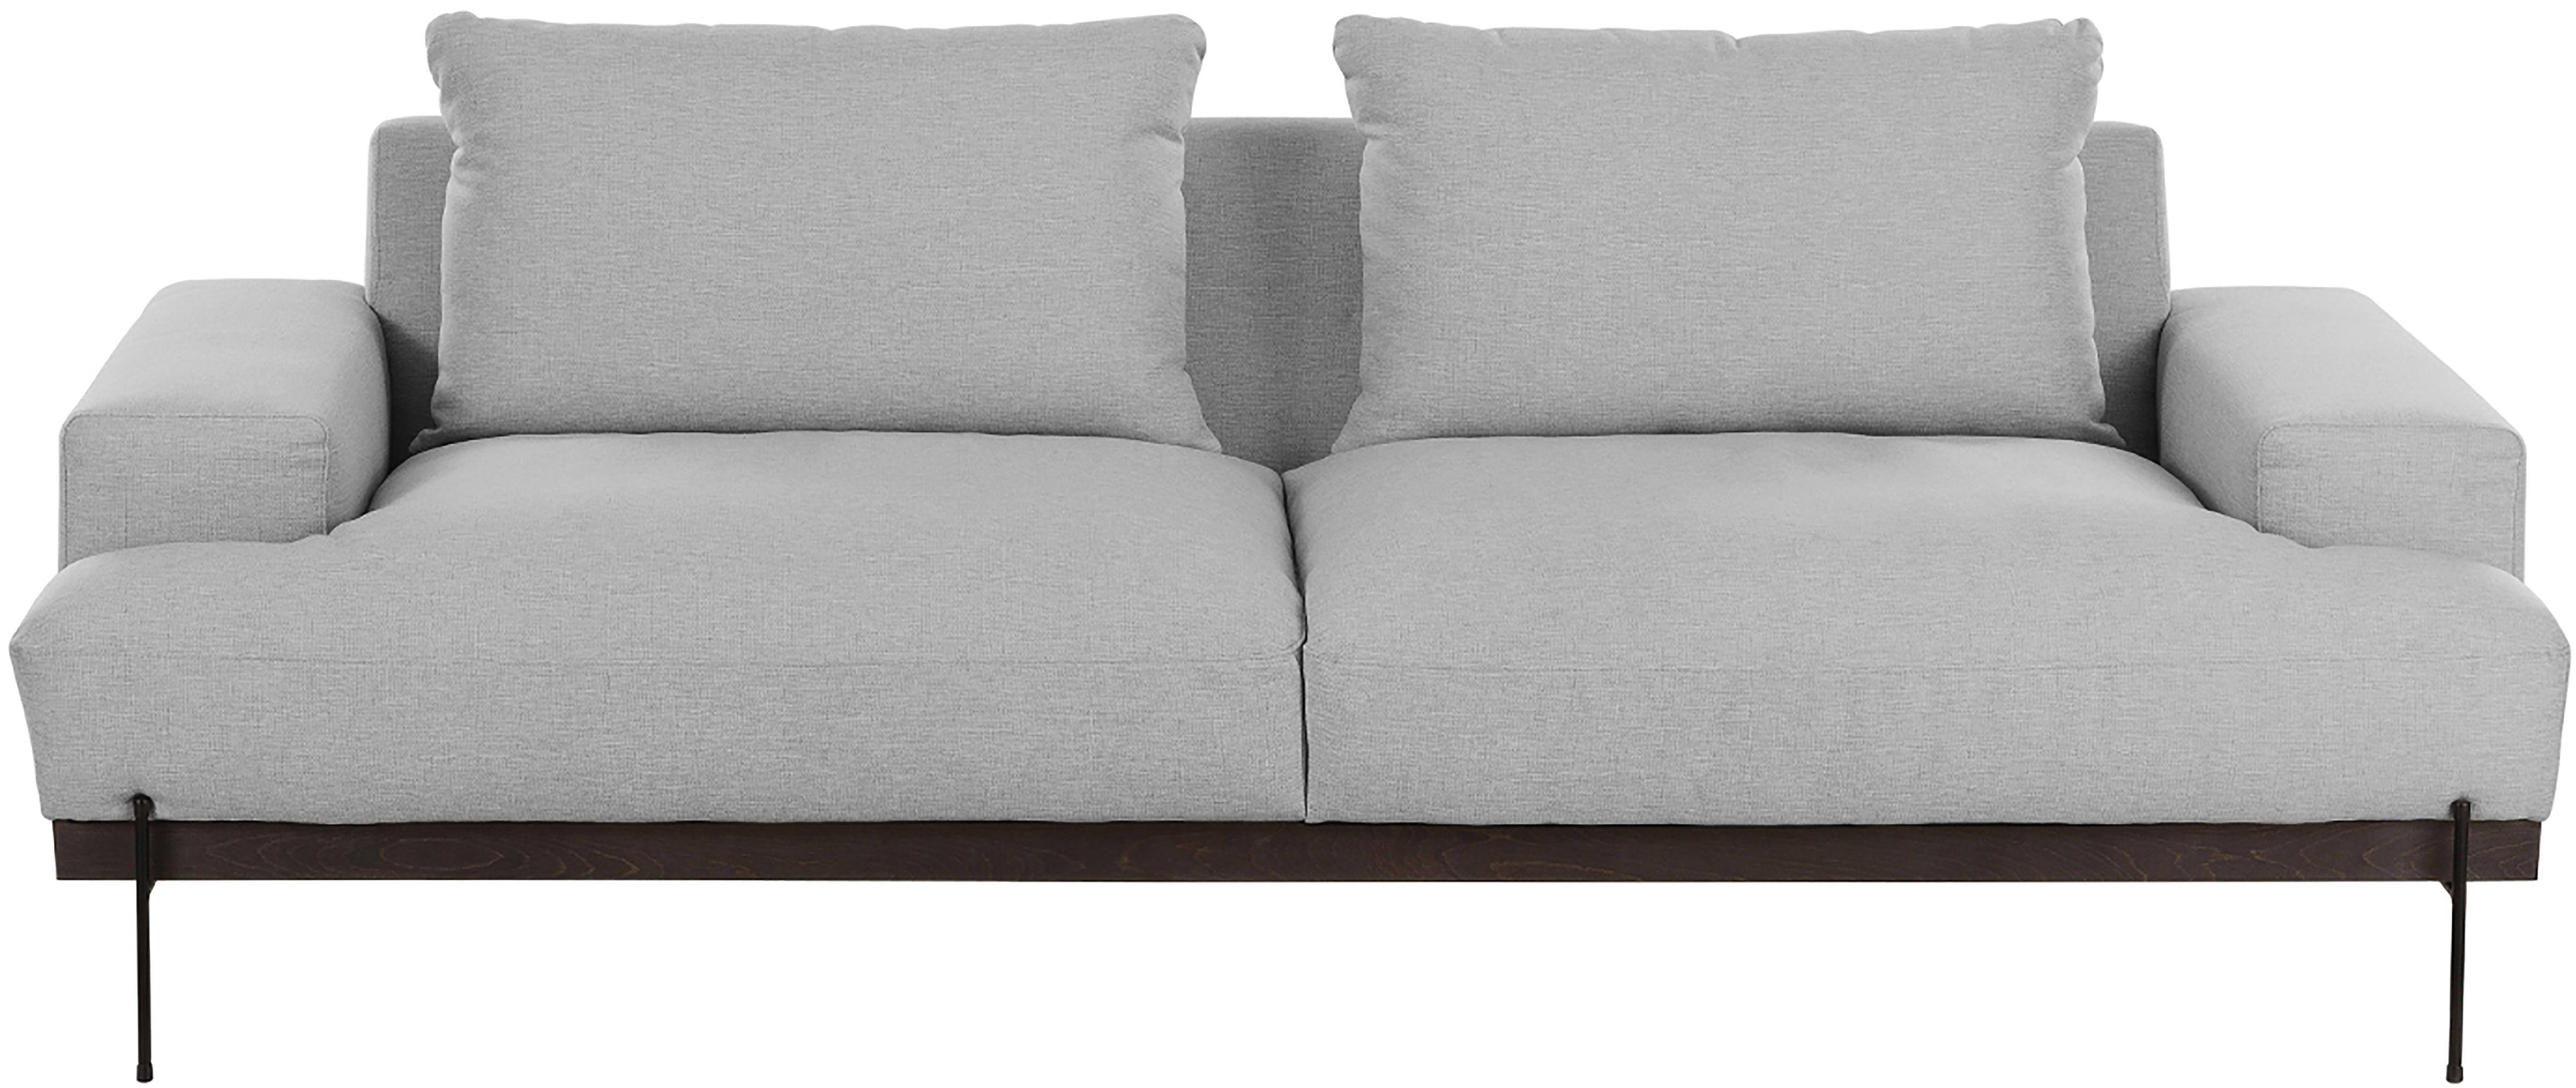 Sofa Brooks (3-Sitzer), Bezug: Polyester 35.000 Scheuert, Gestell: Kiefernholz, massiv, Rahmen: Kiefernholz, lackiert, Webstoff Grau, B 230 x T 98 cm